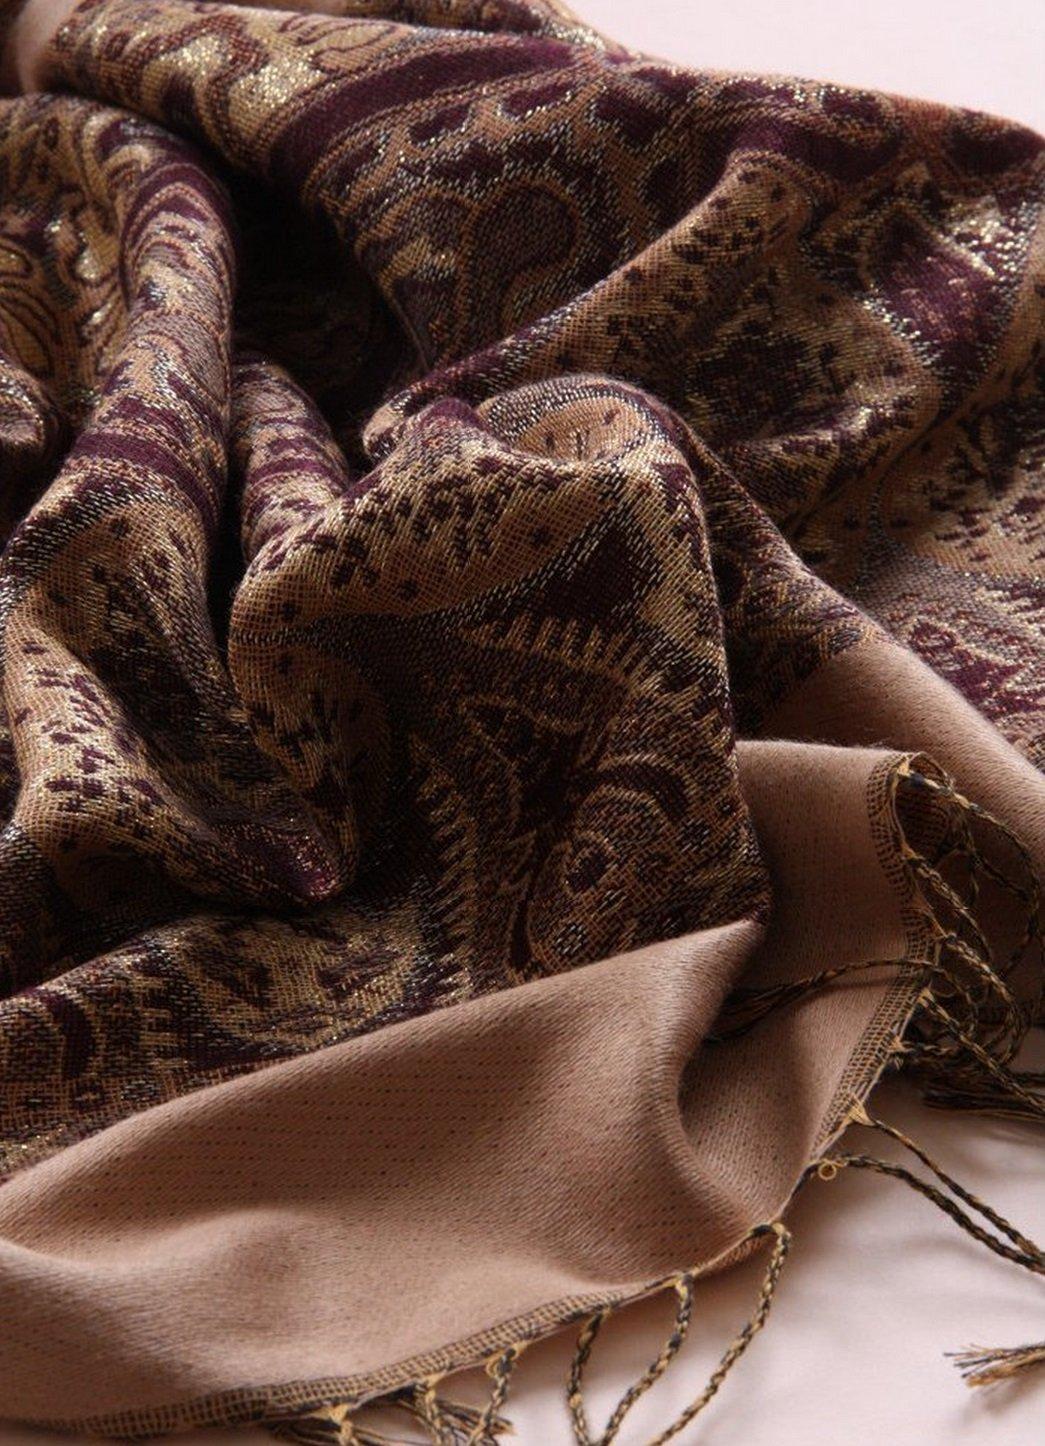 Onlineb2c Women's Woven Reversible Paisley Pashmina Shawl Wrap Camel by Onlineb2c (Image #4)